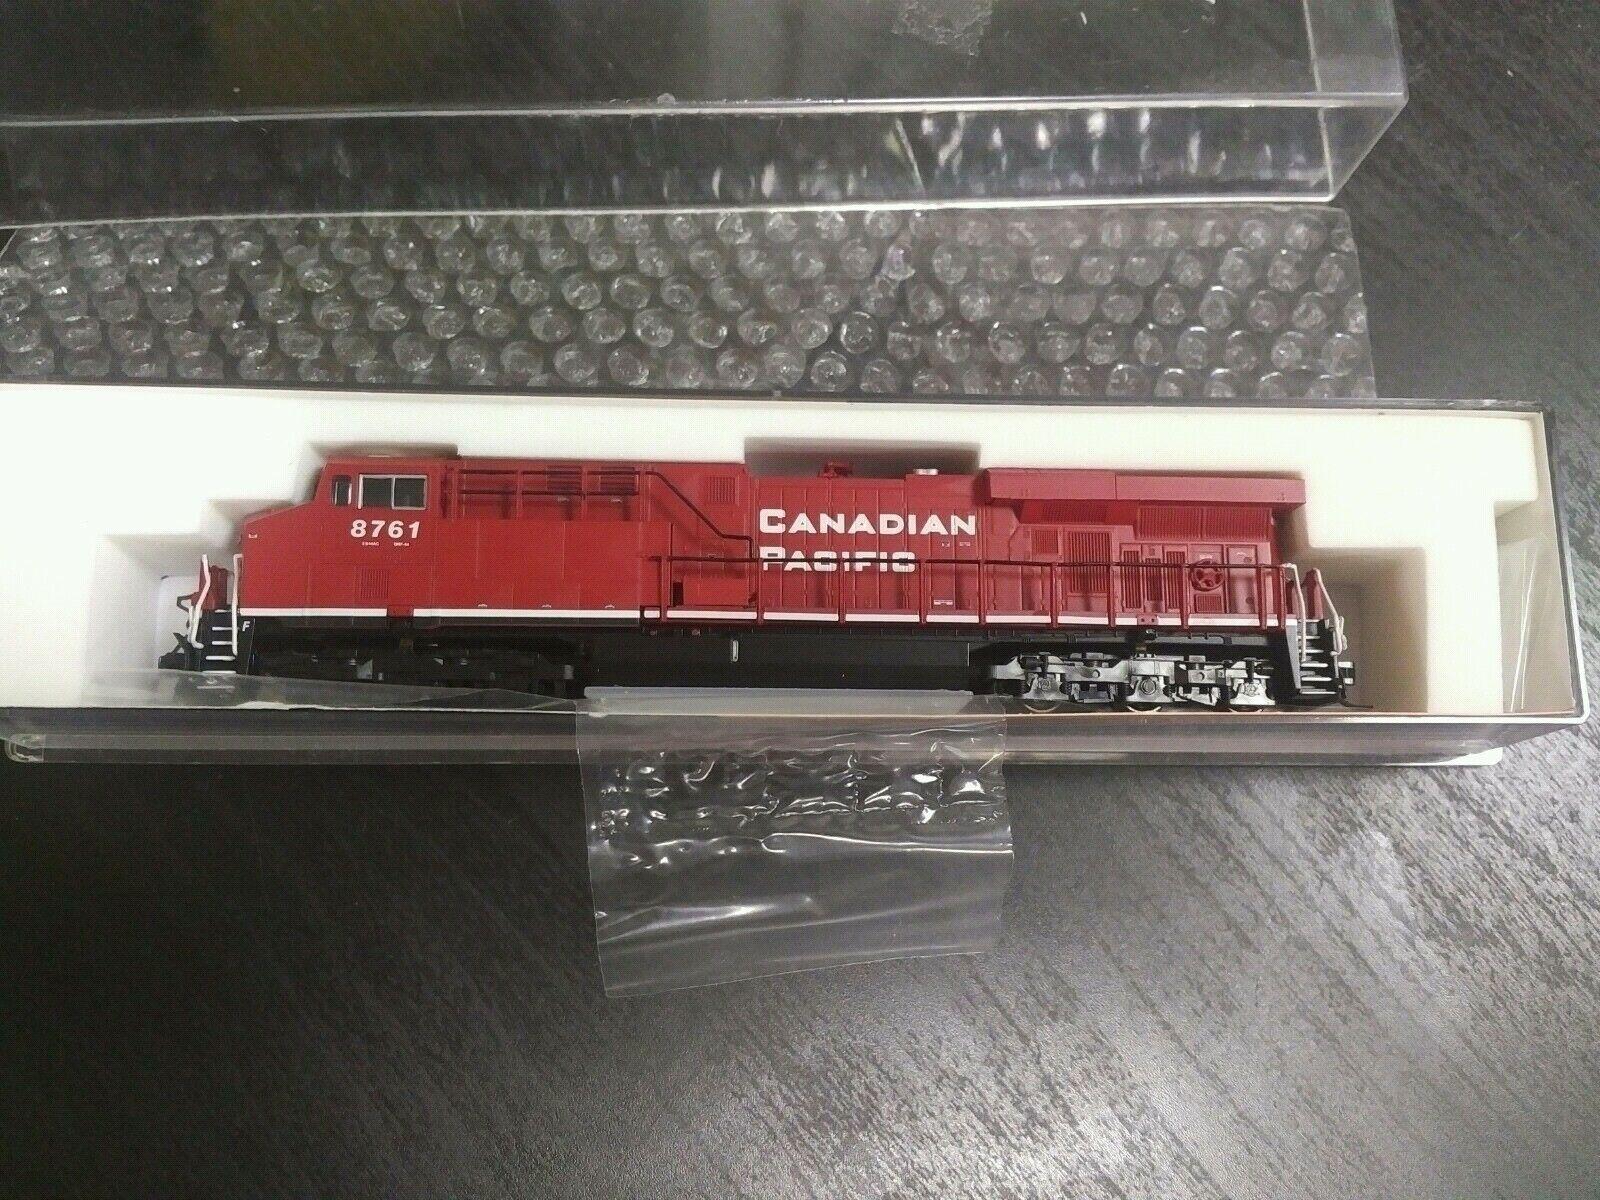 Fox Valley Models N-Scale Canadian Pacific GE-ES-F. FVM 70151, RdNIB